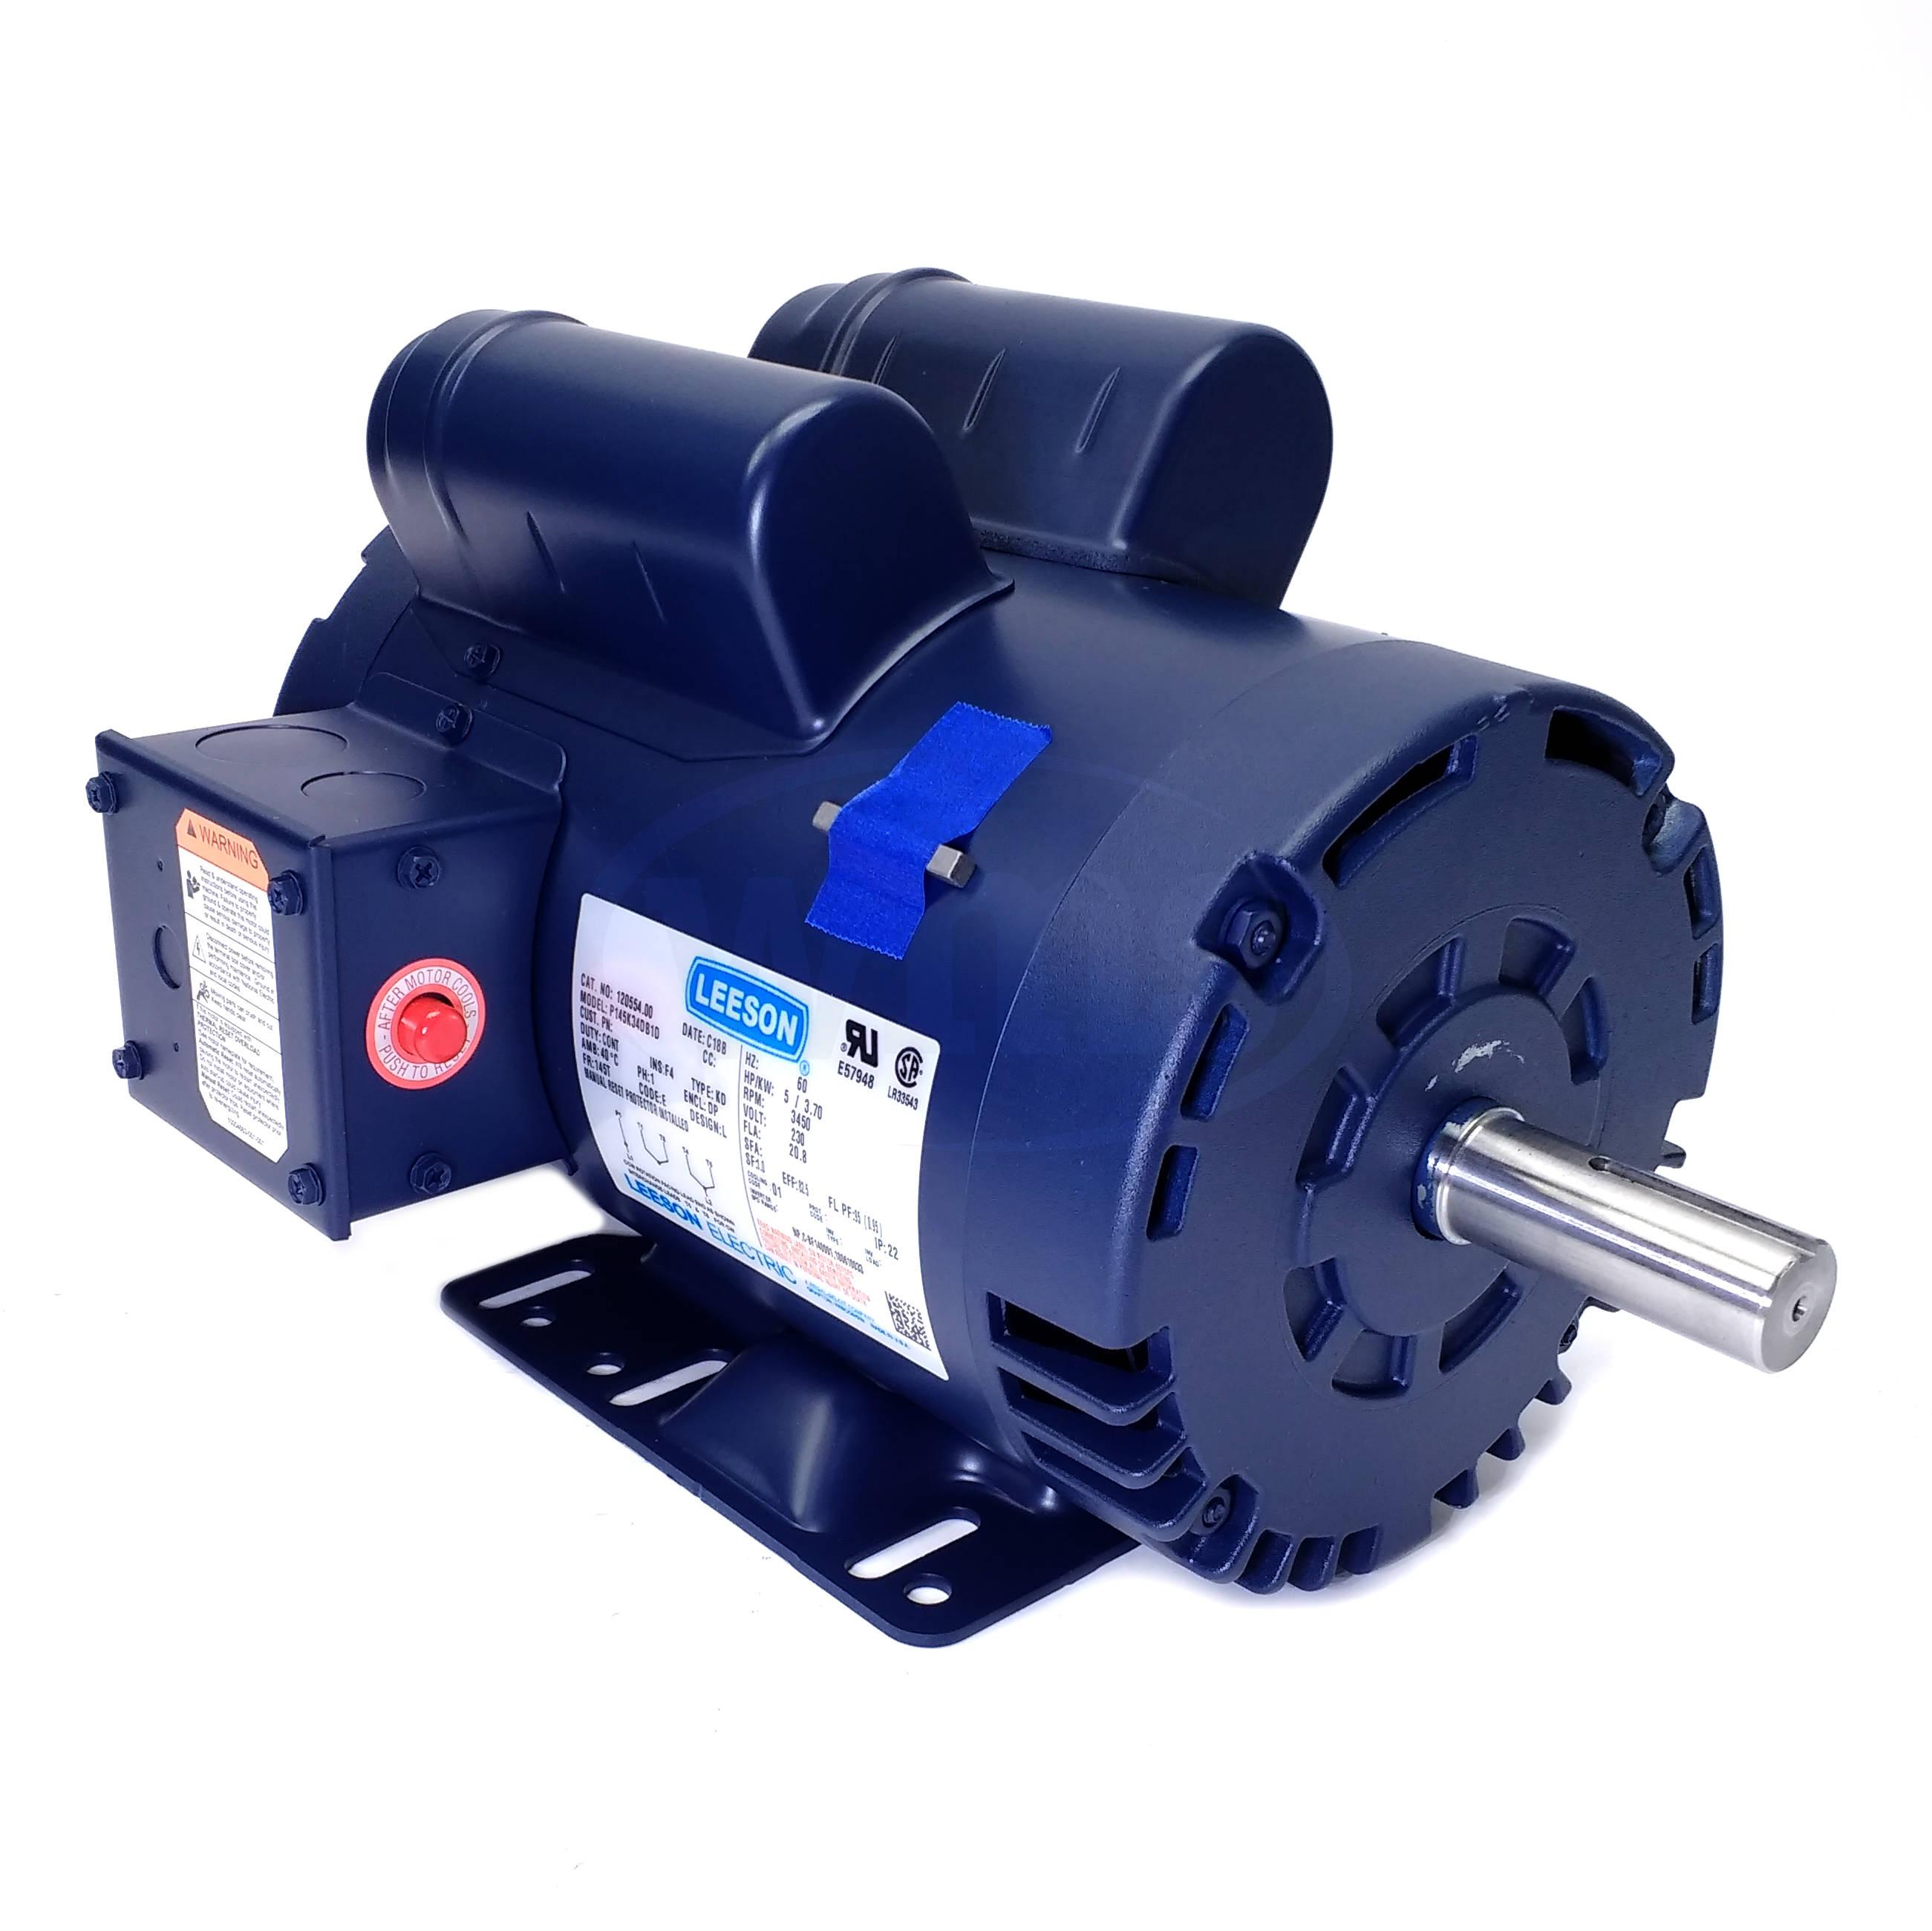 hight resolution of leeson 5 hp compressor motor wiring wiring diagram operations leeson 5 hp compressor motor wiring